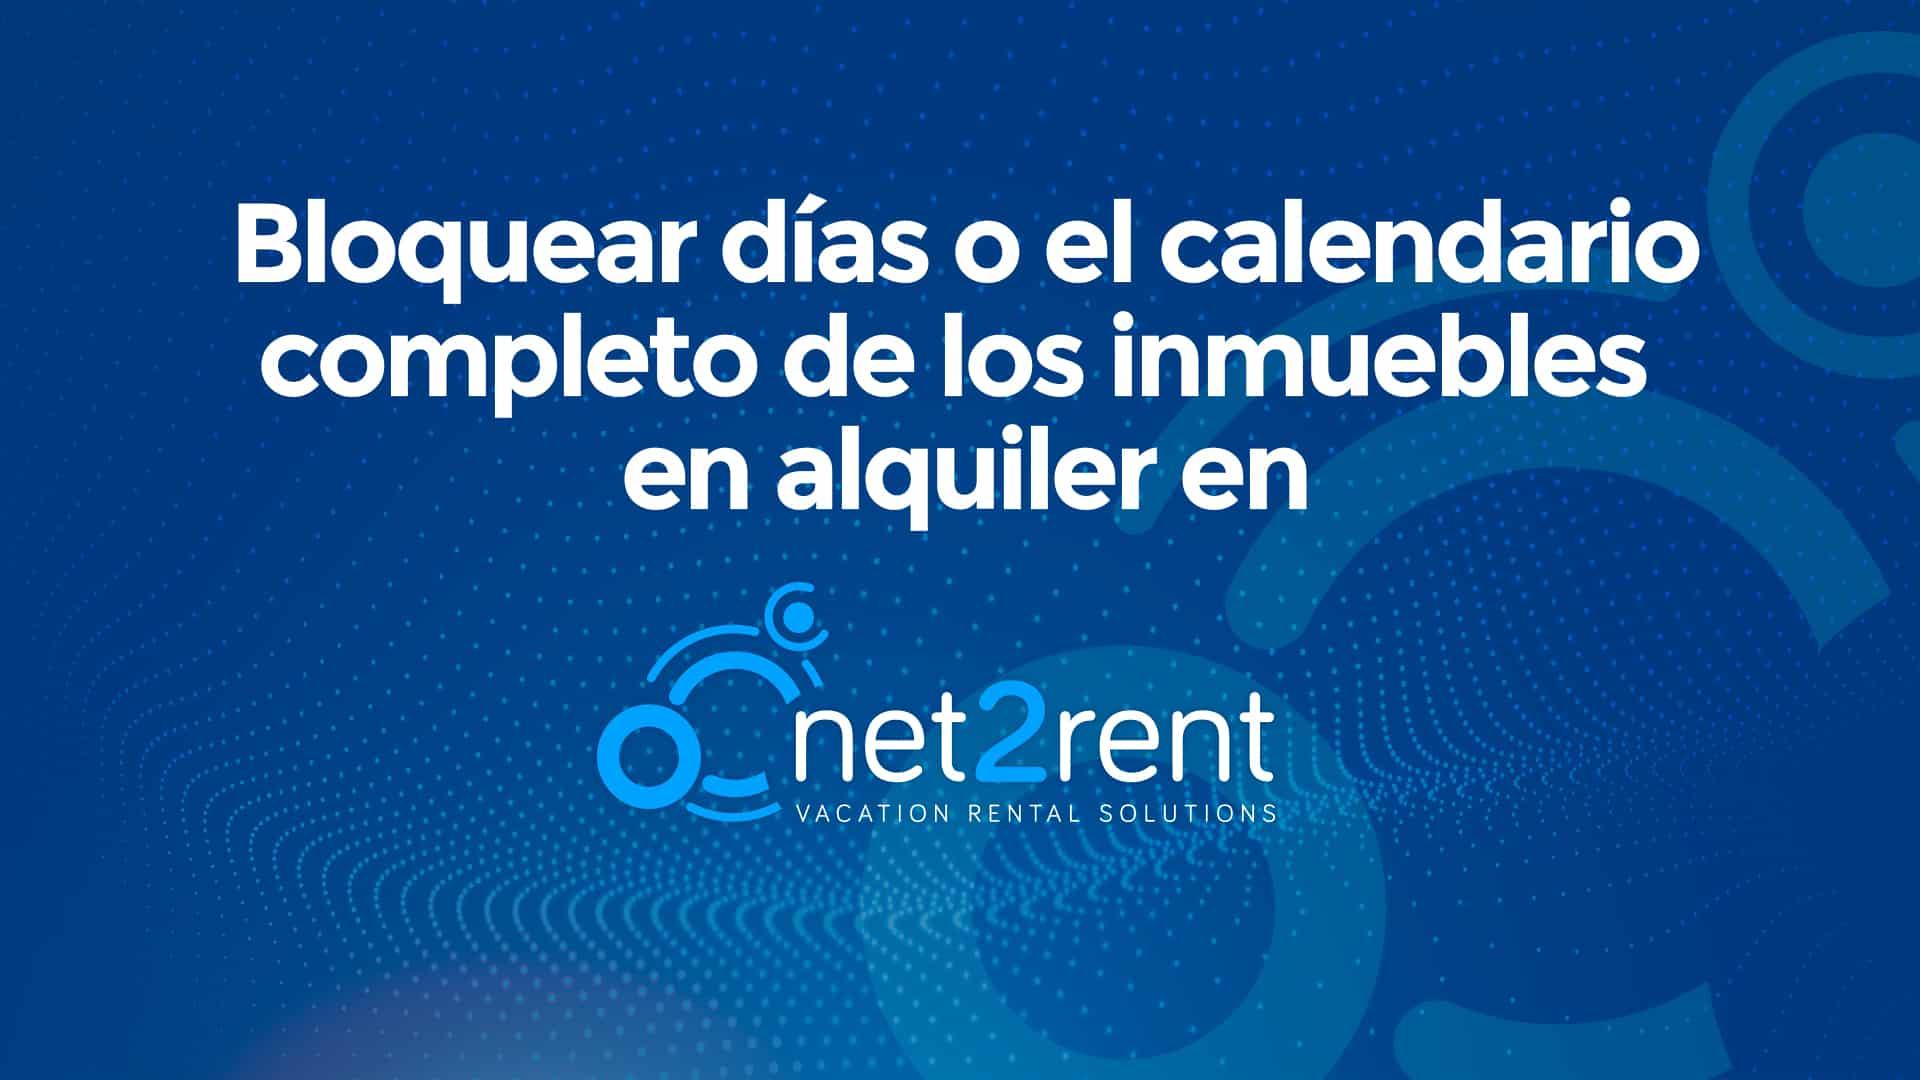 Guías Rápidas de net2rent: 07 - BLOQUEAR INMUEBLES